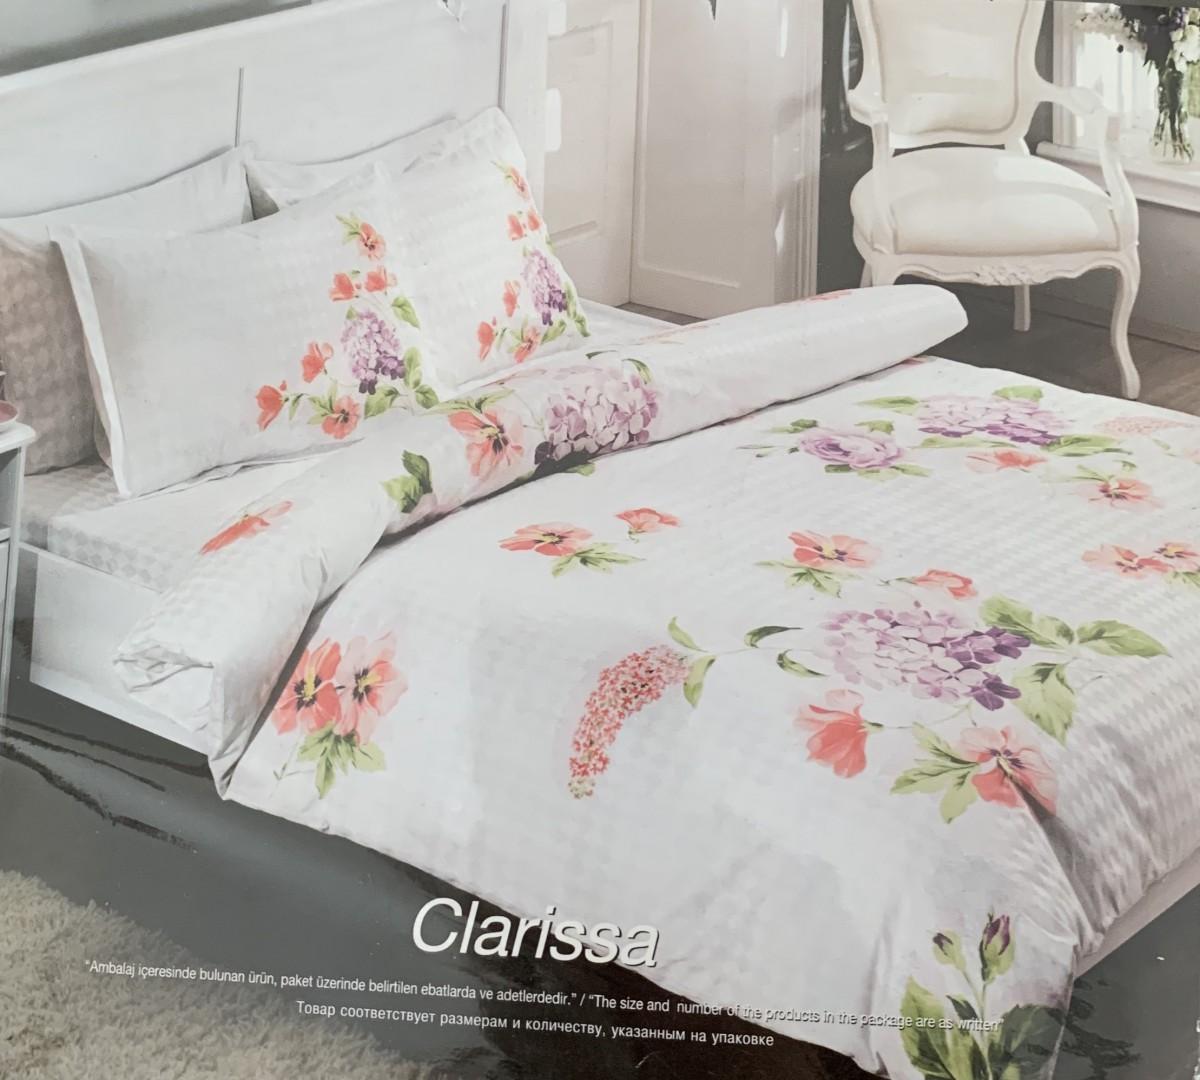 Komplet pościeli Percale Clarisse 200x220cm